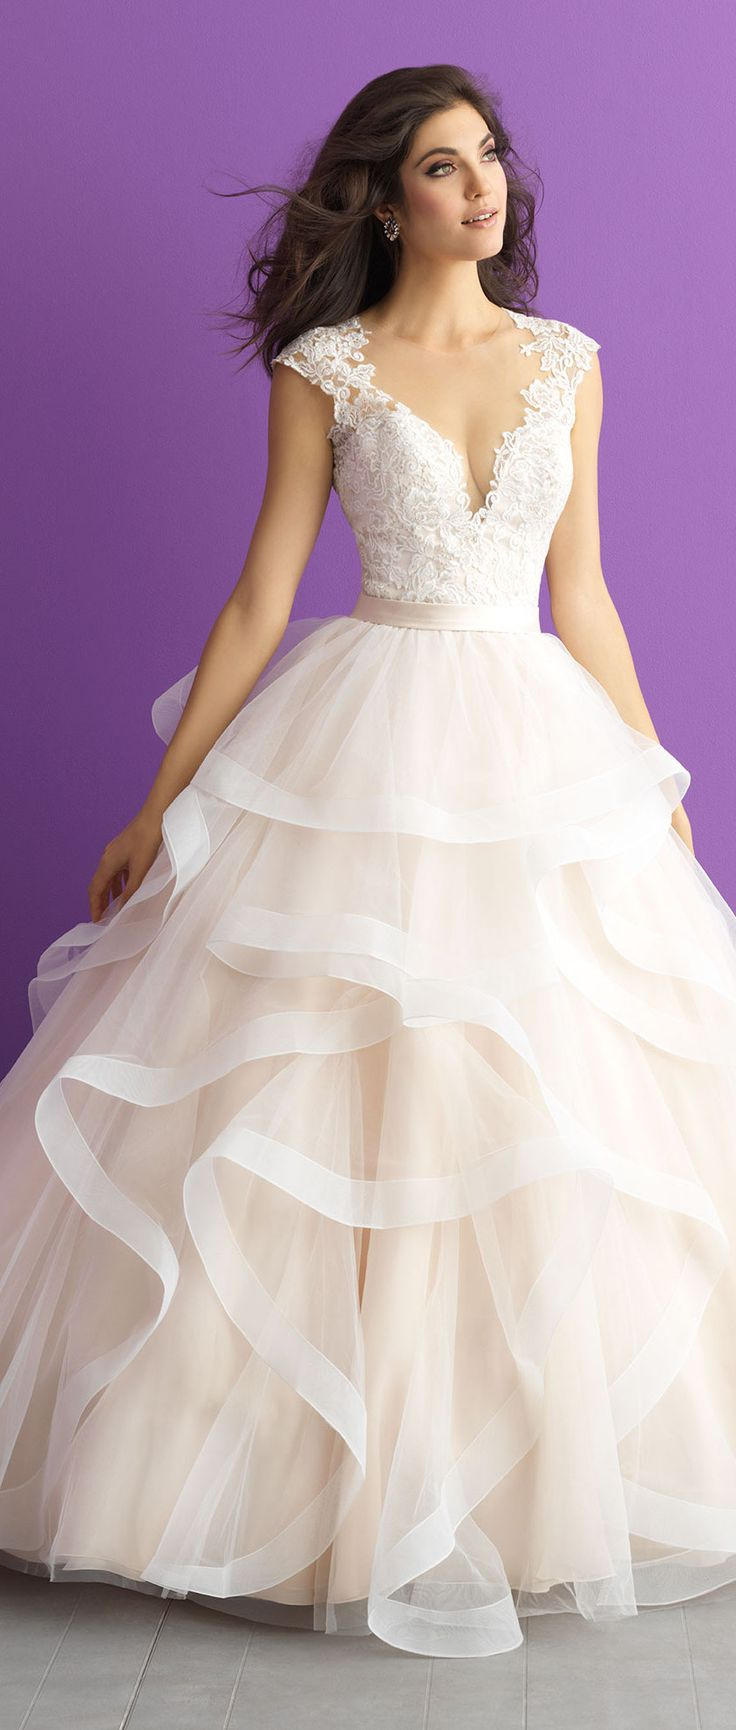 17 Best ideas about Romantic Wedding Dresses on Pinterest ...